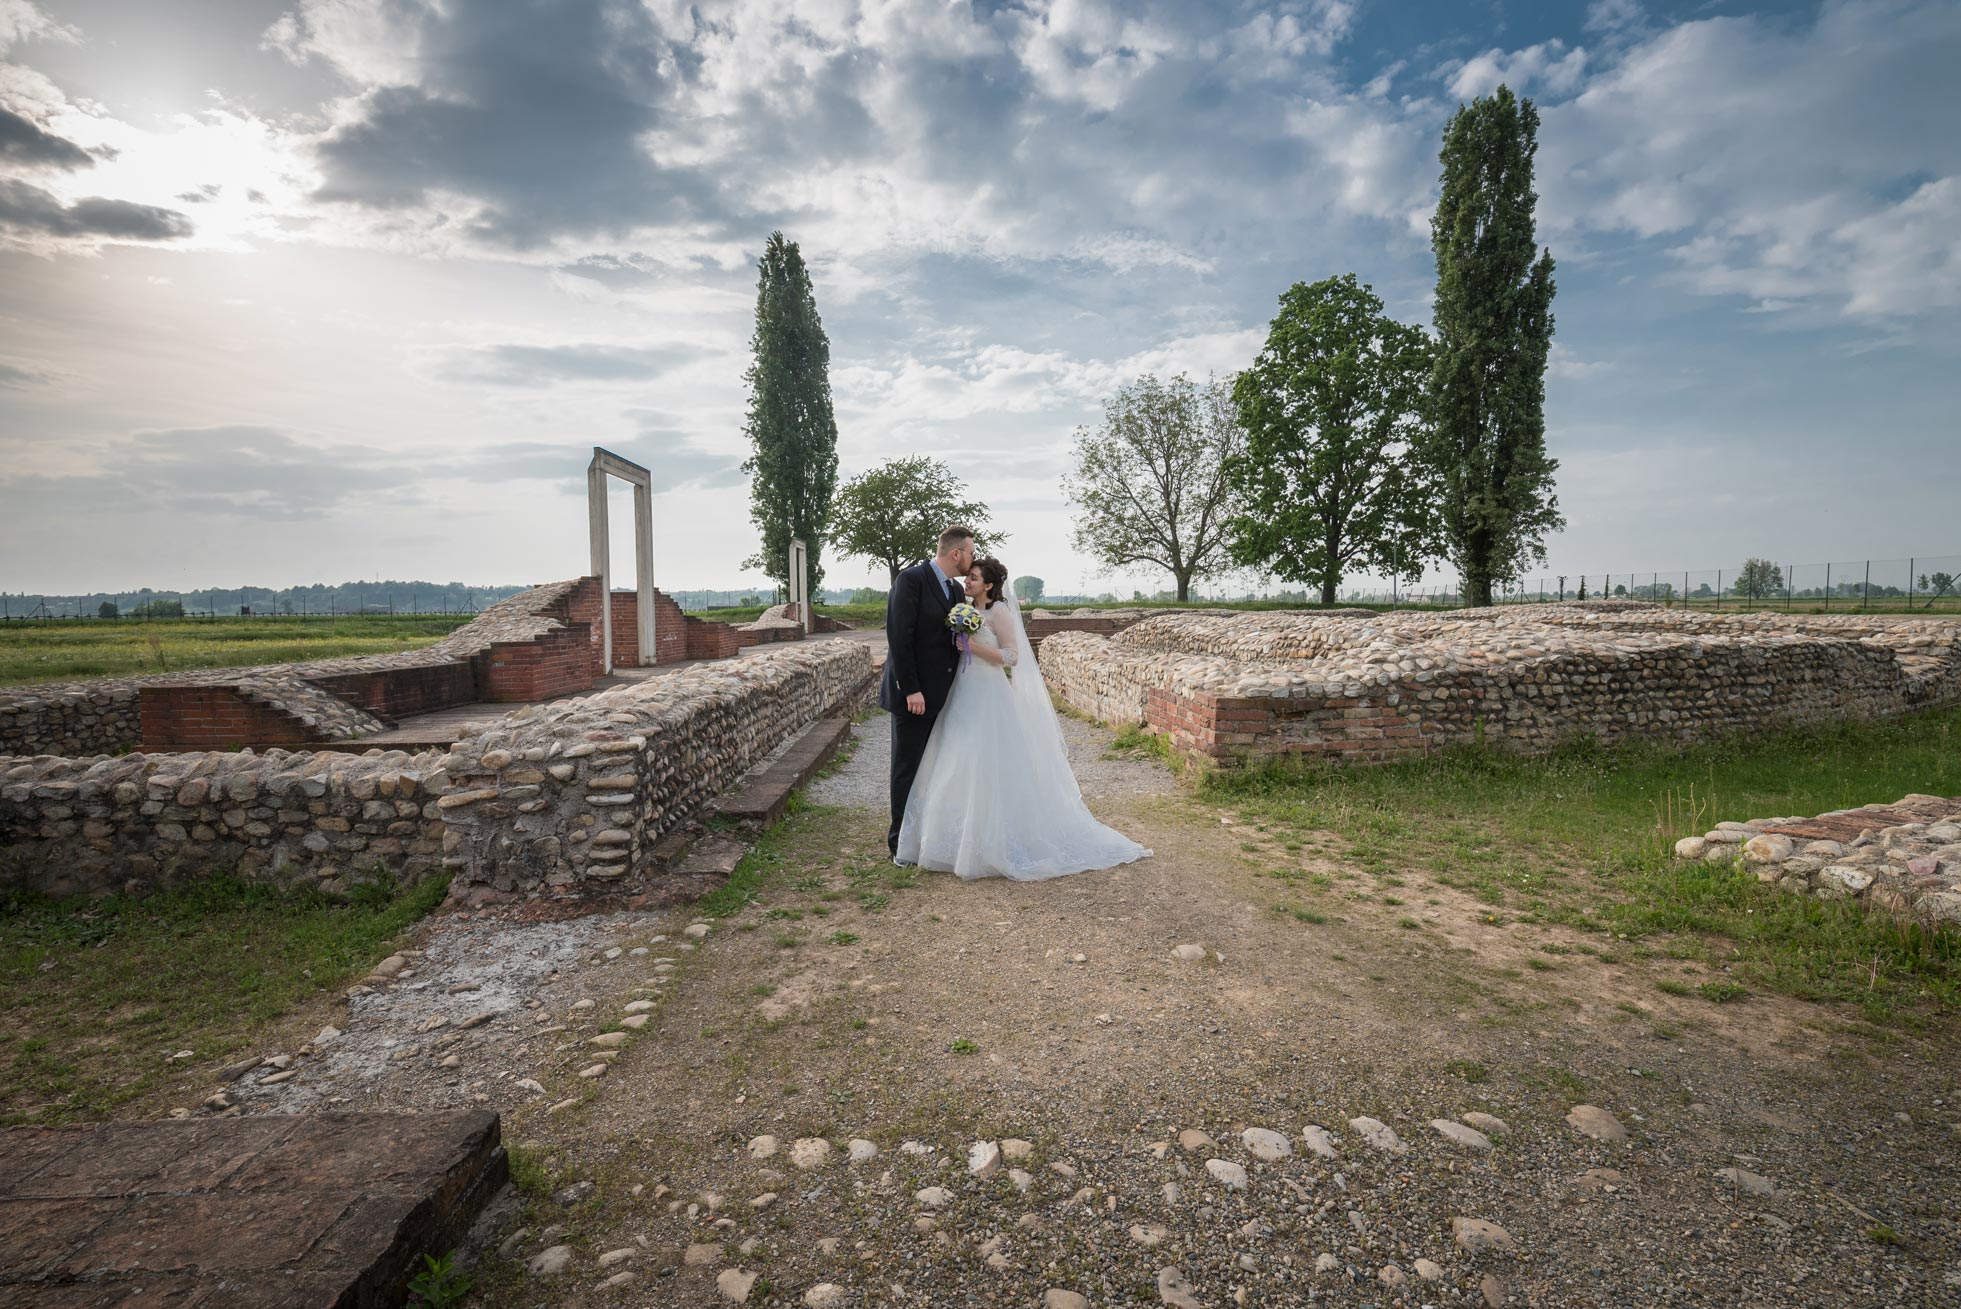 Matrimonio a Narzole Lorenza Diego - DSC 0665 - Fotografie matrimonio aritstiche - Fotografie matrimonio aritstiche